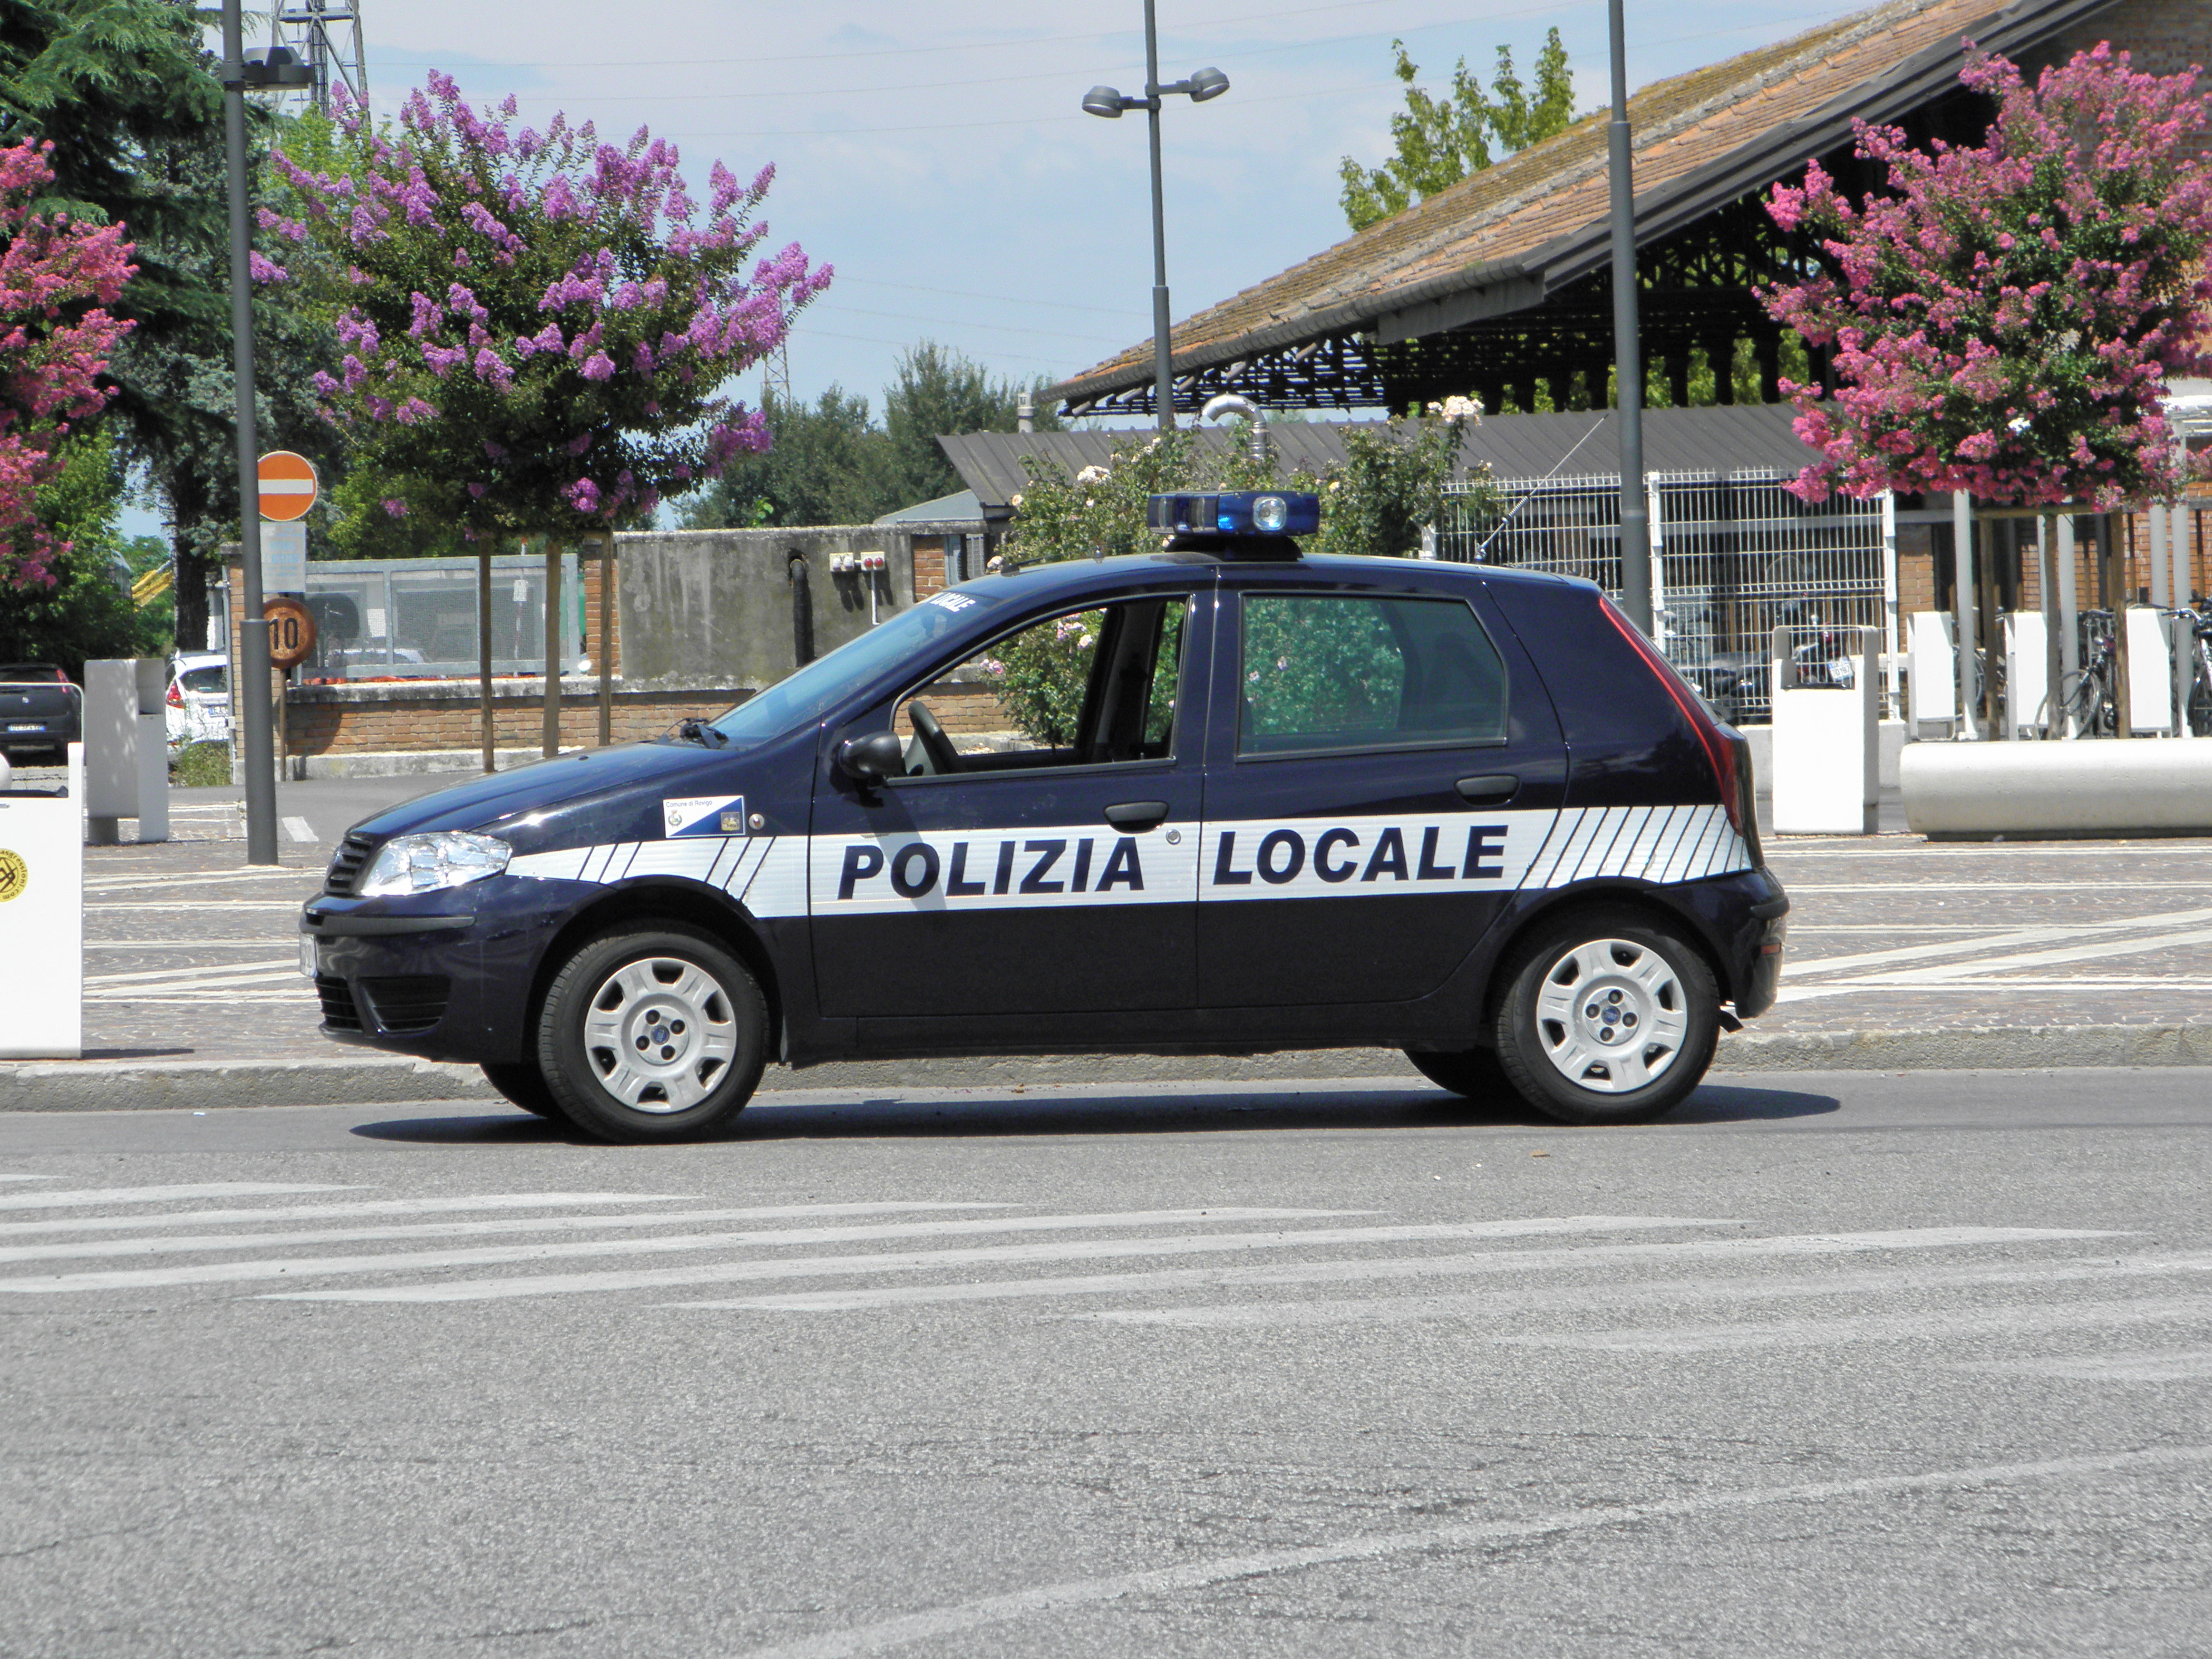 file/ELEMENTO_NEWSLETTER/19975/Polizia_Municipale_Rovigo_20190710.JPG